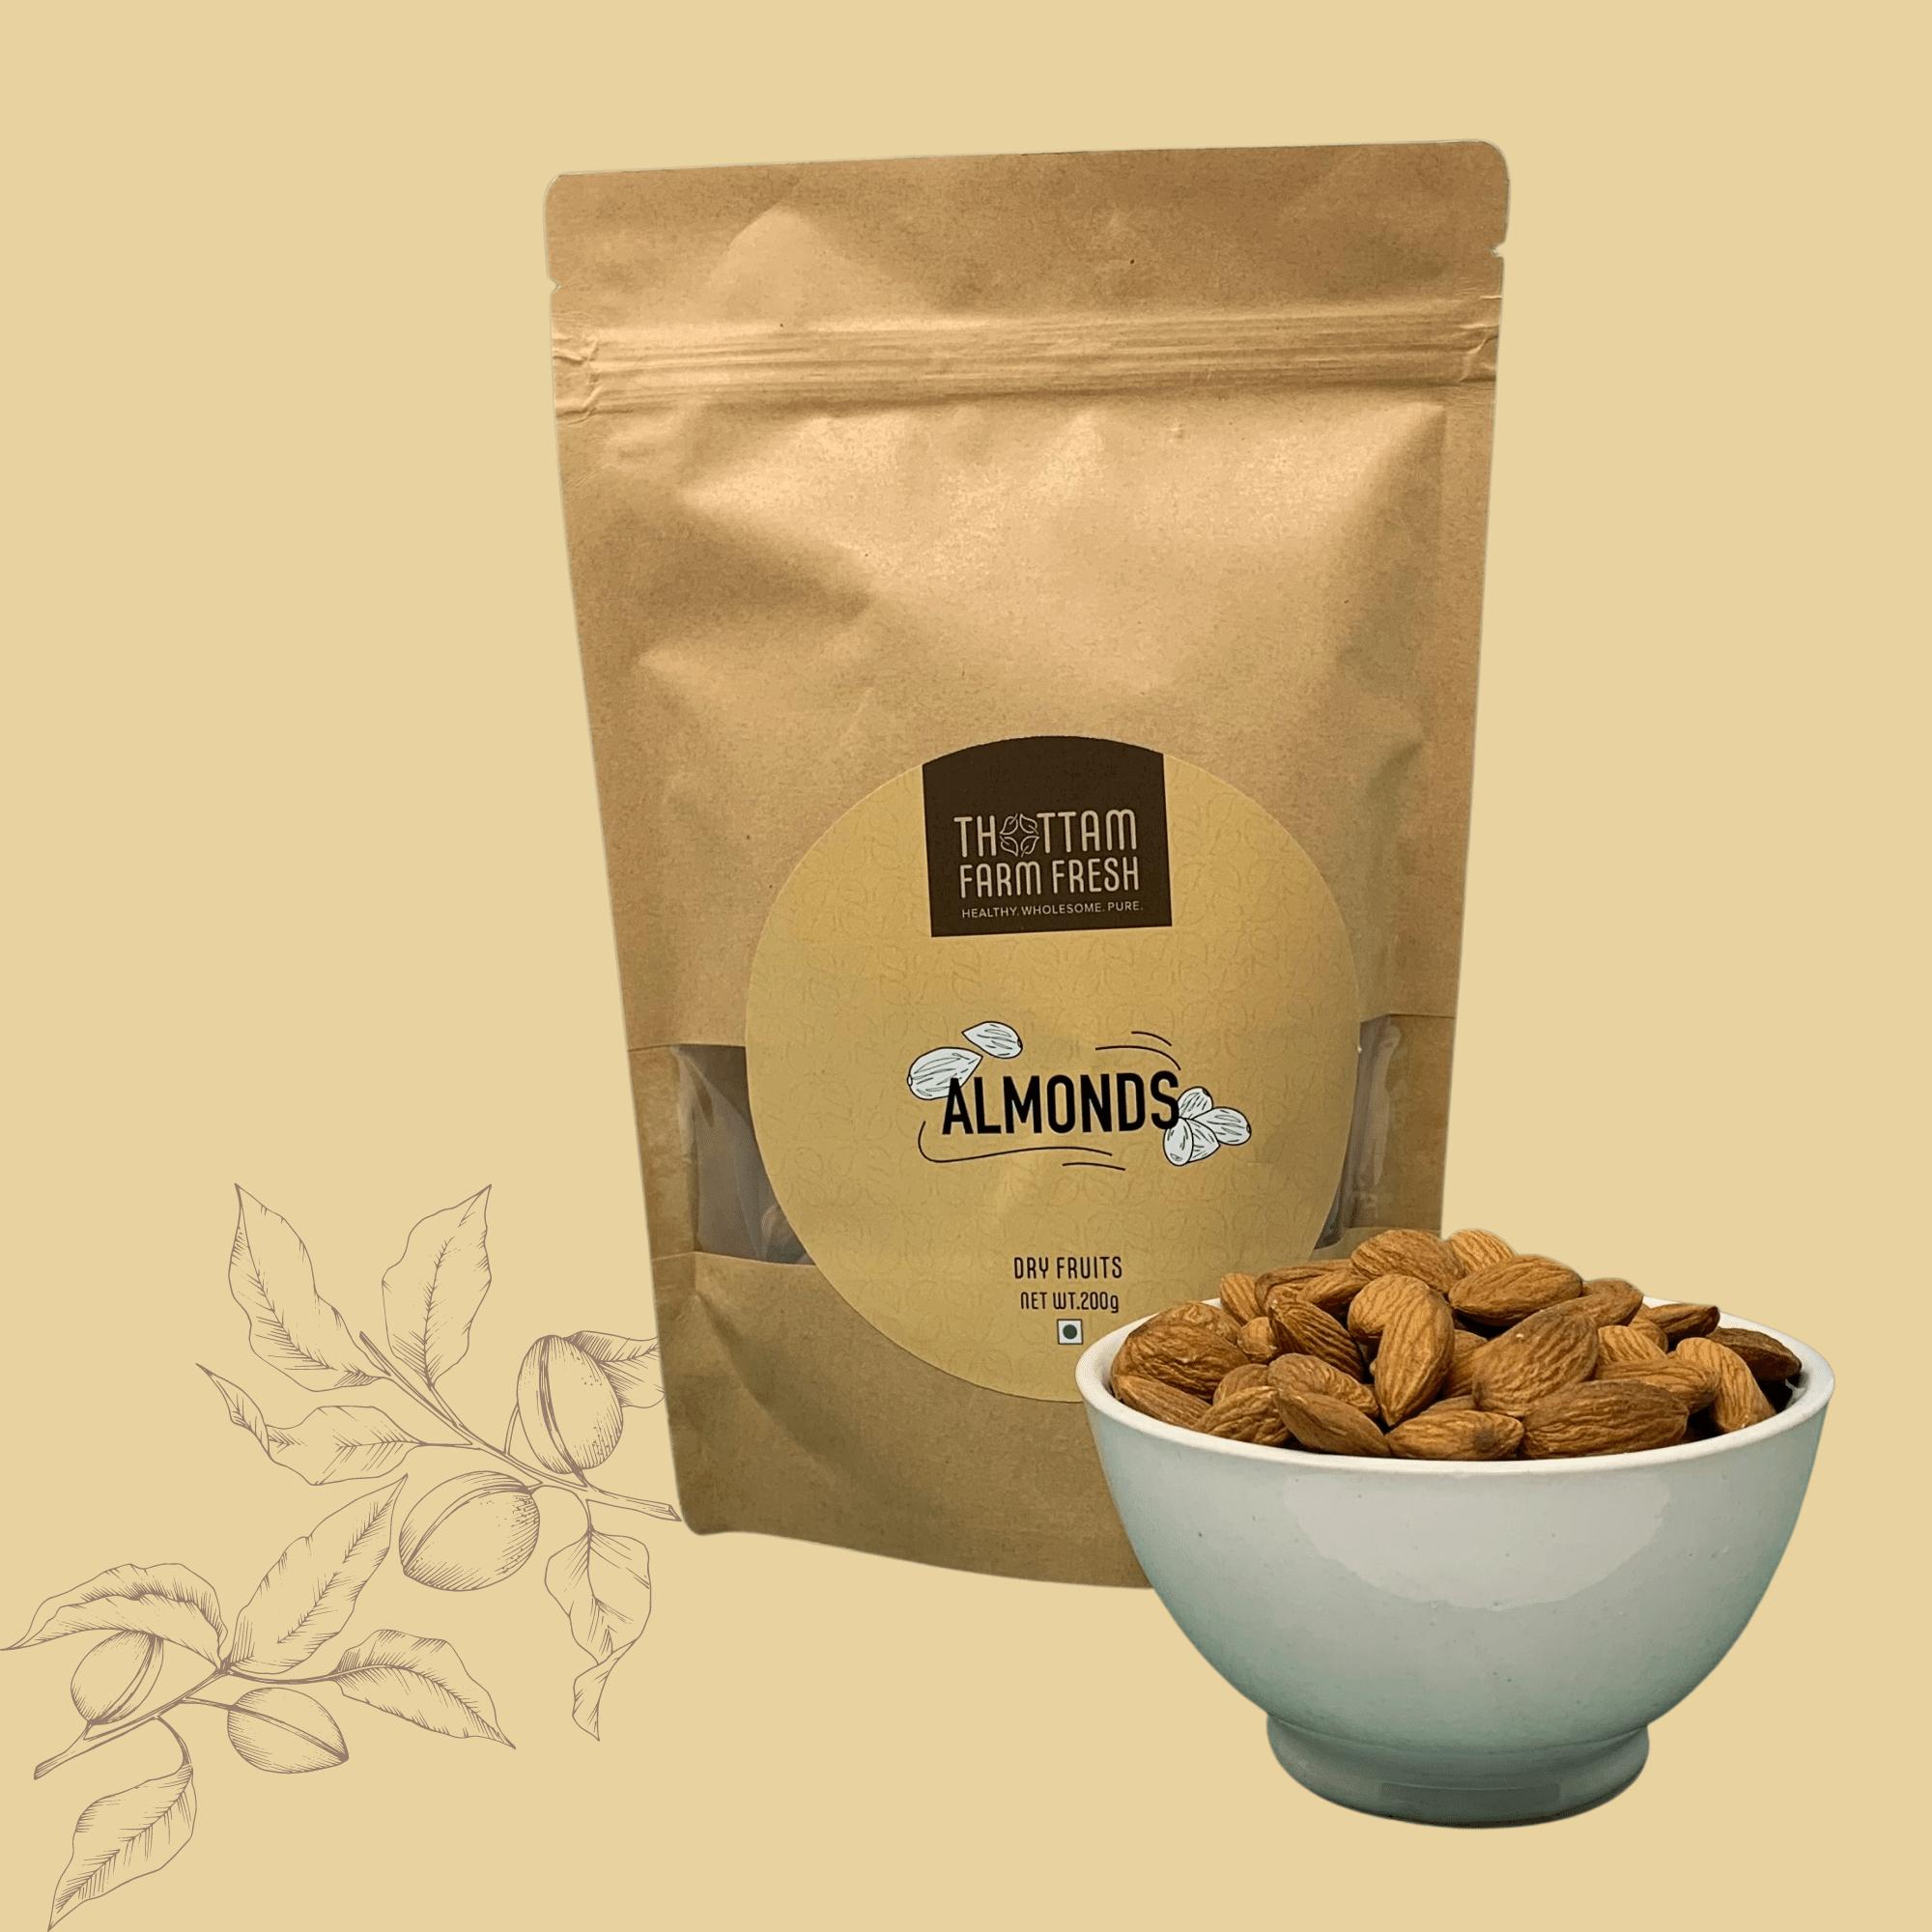 Thottam Farm Fresh Almonds Online